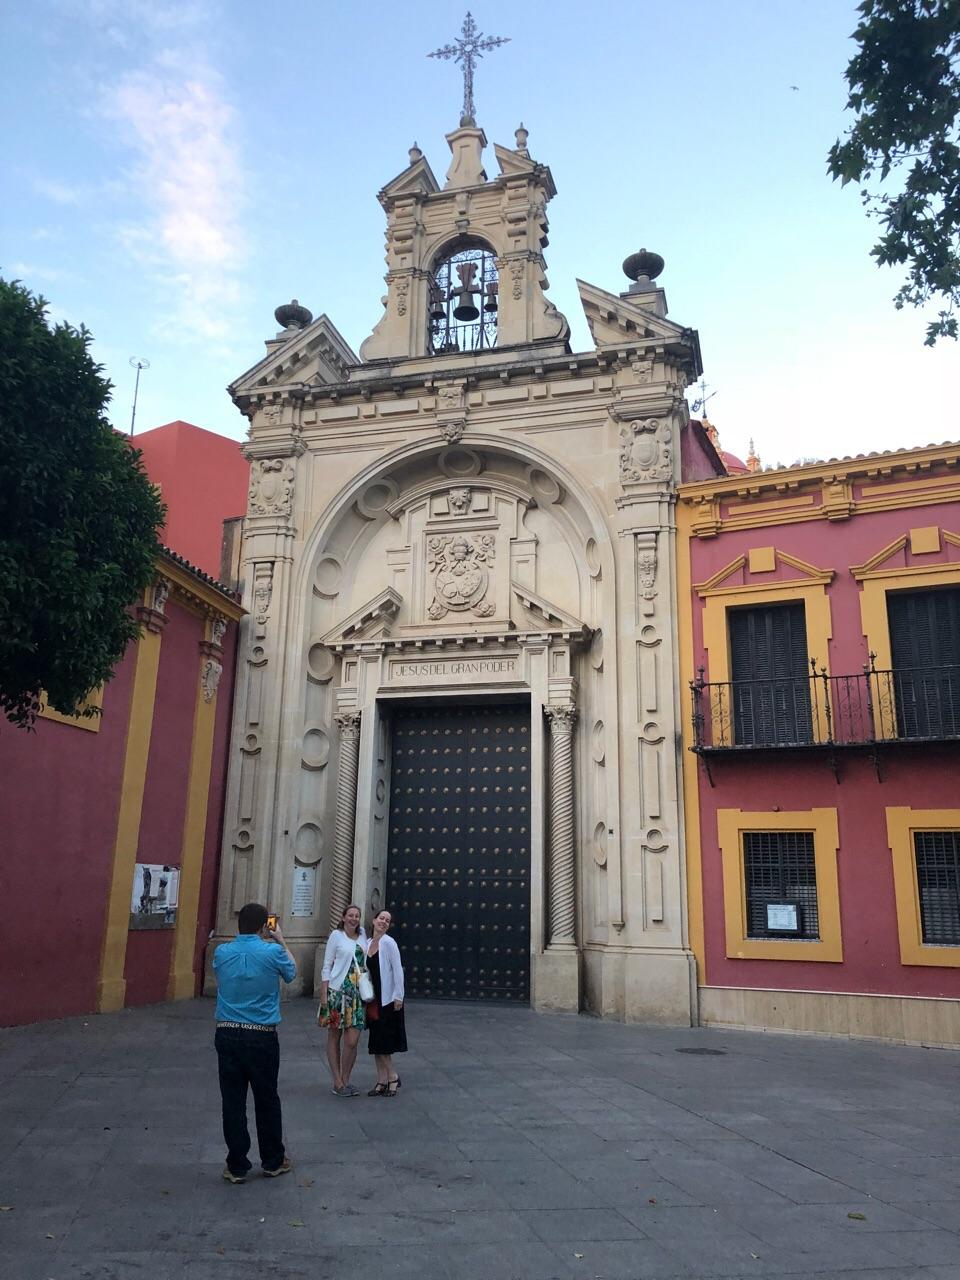 Seville Trip, Day 5